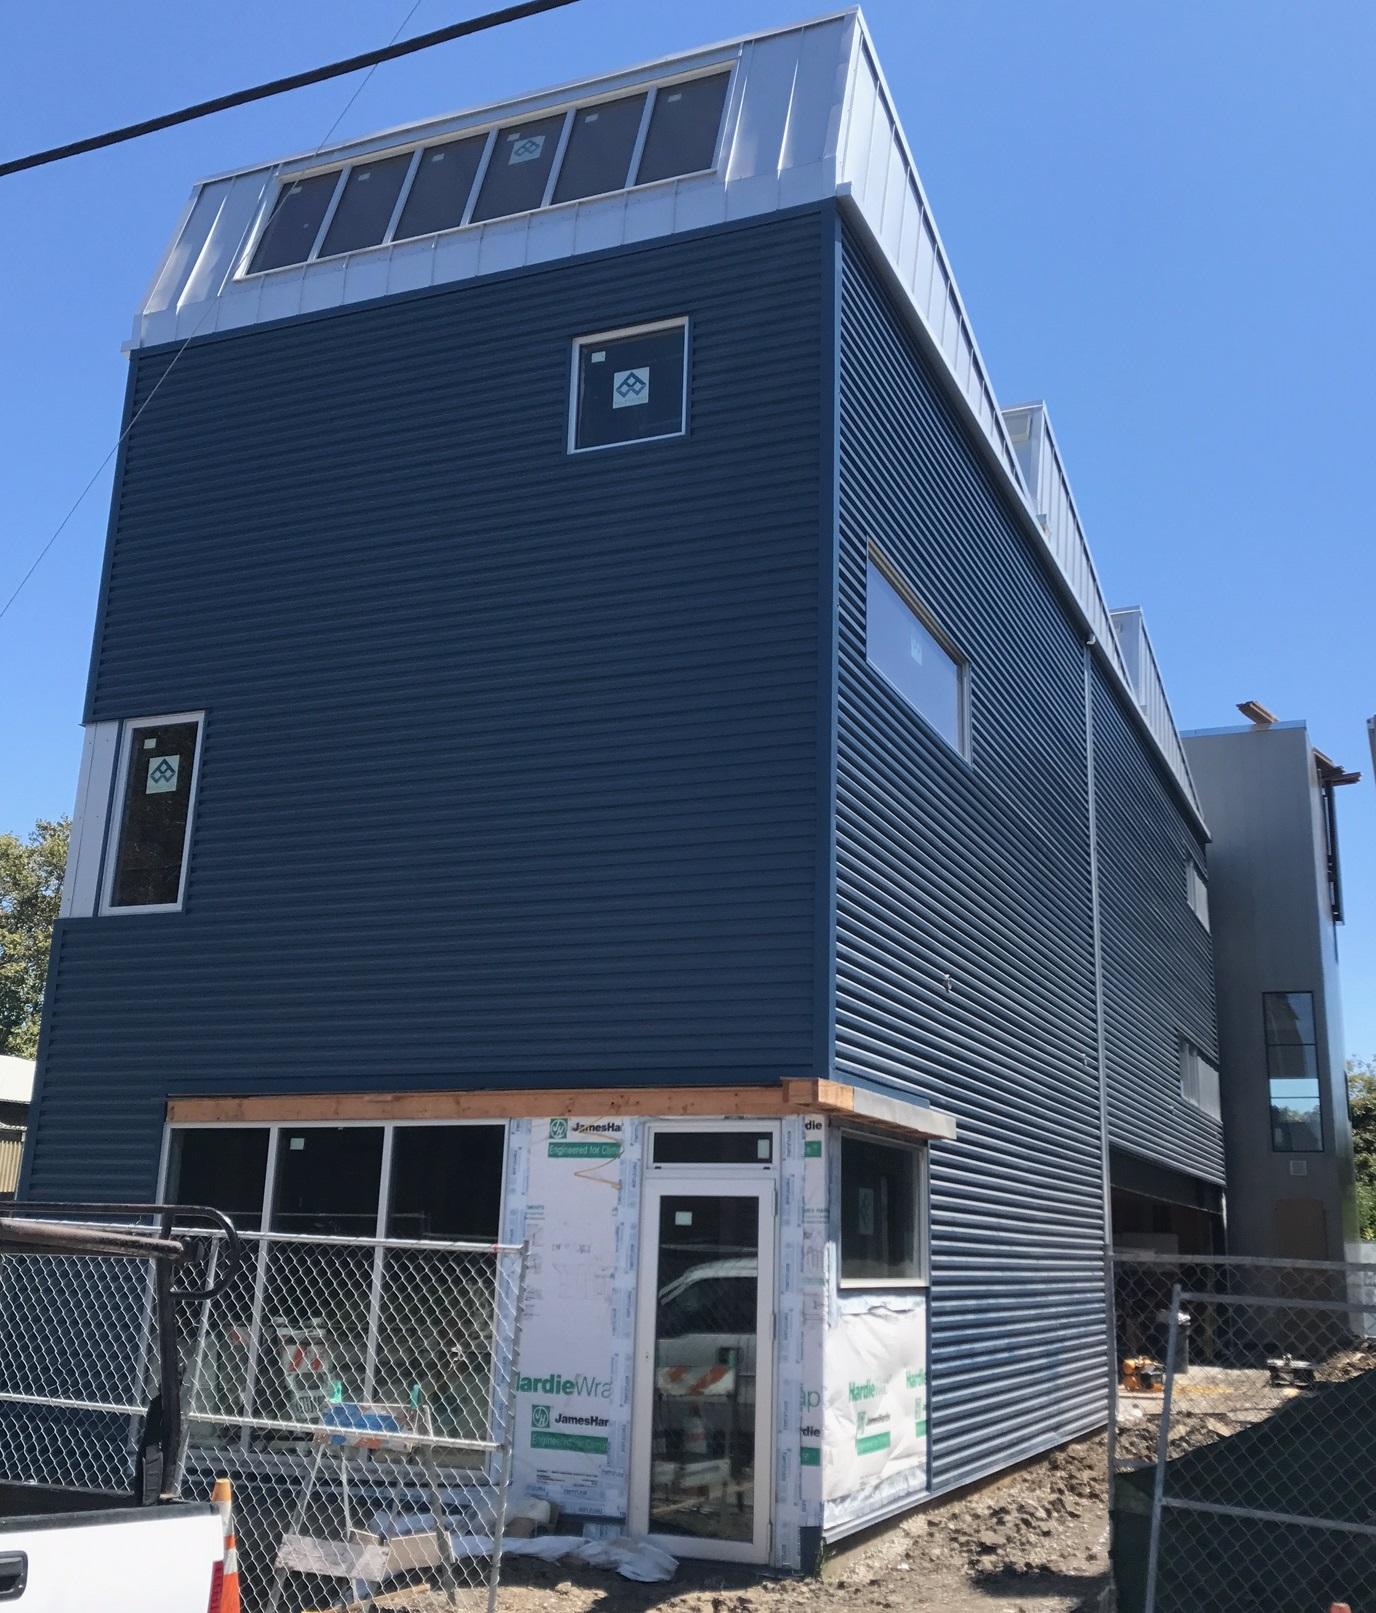 22 ga siding panels